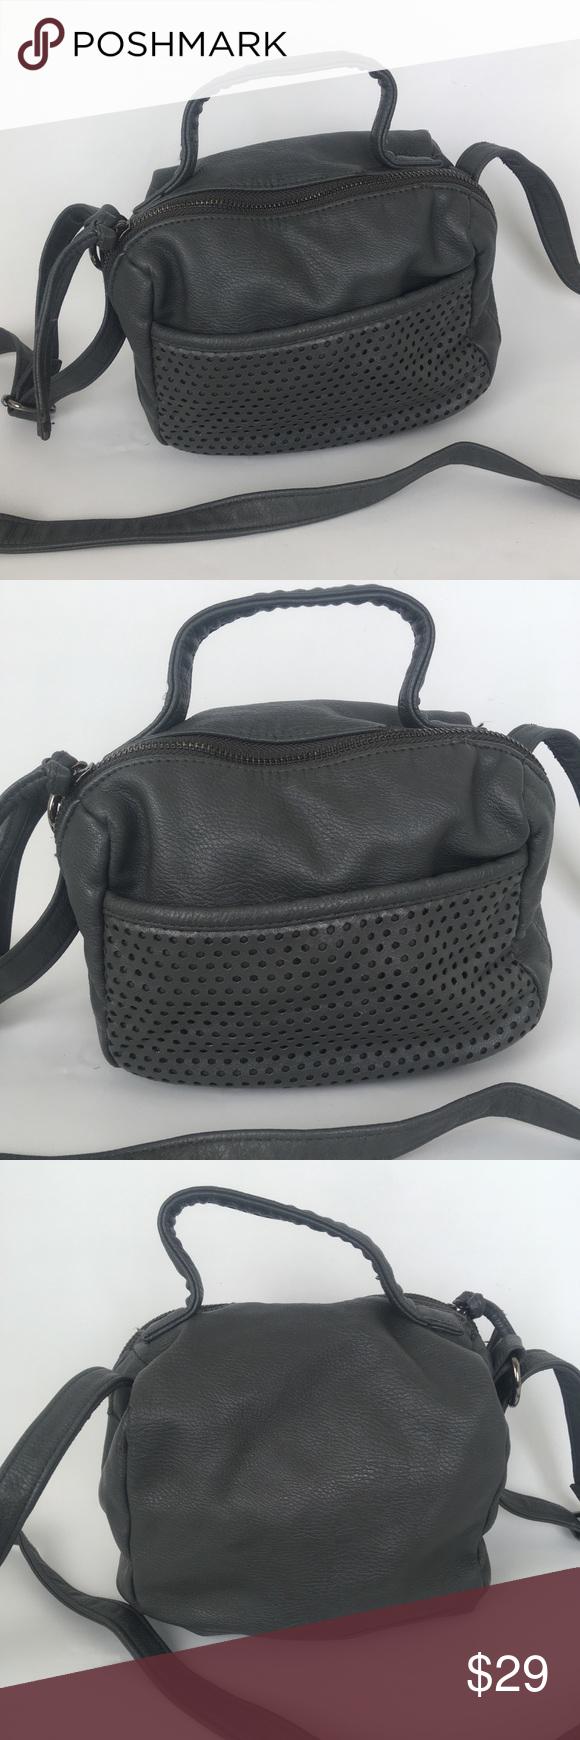 043be09f6d6d Converse One Star crossbody bag Converse One Star crossbody bag in gently  used condition. Gray color